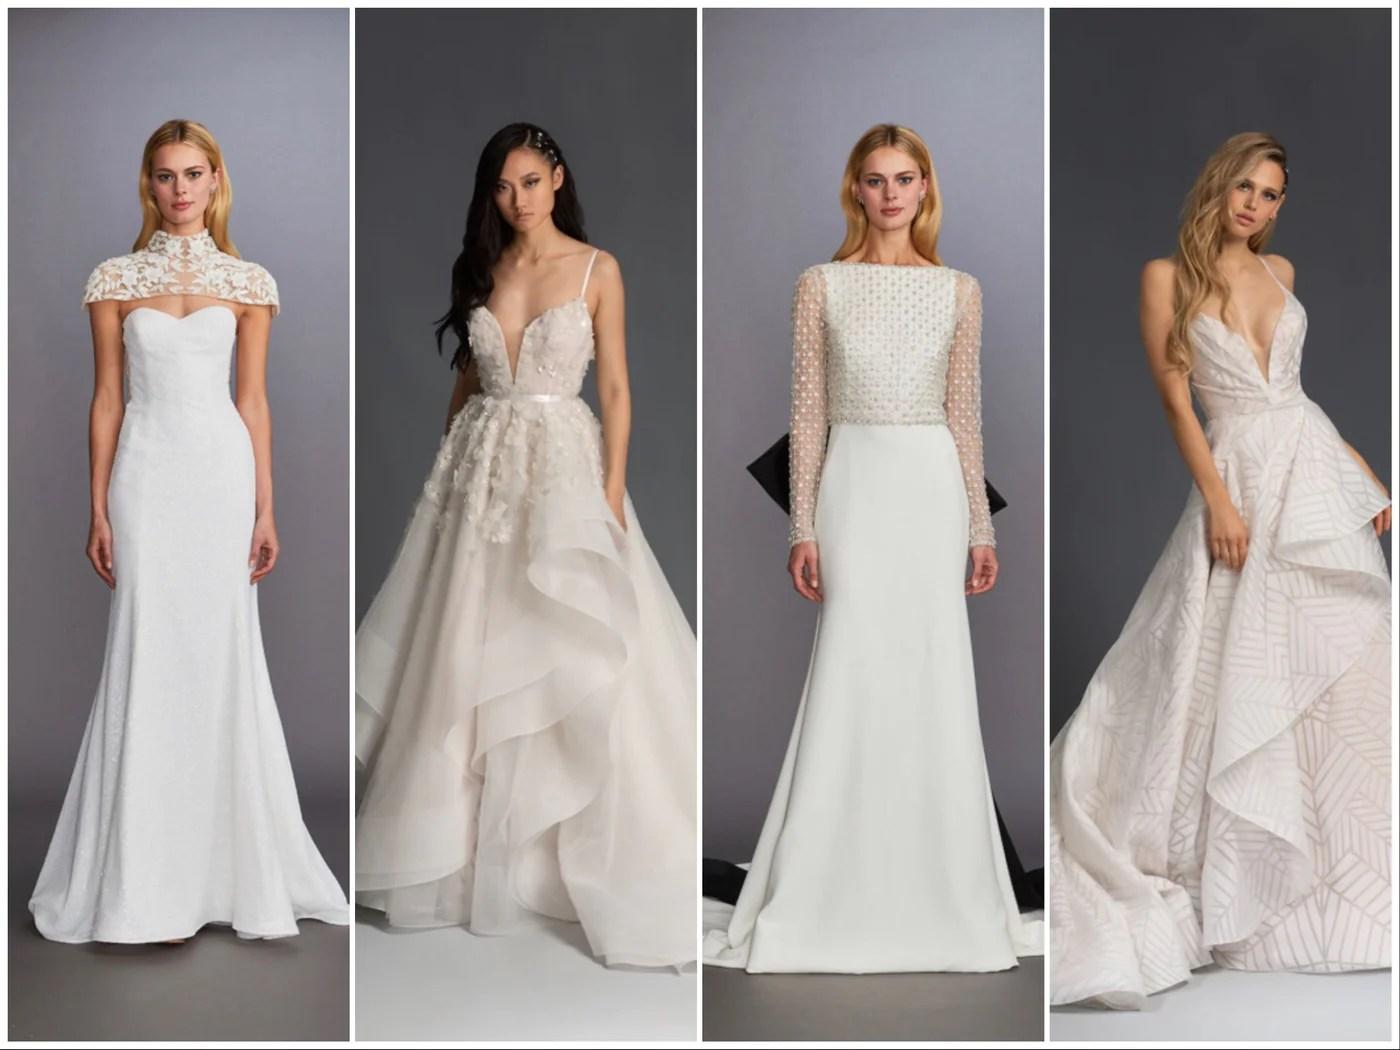 Couture Wedding Dress Designers Melbourne